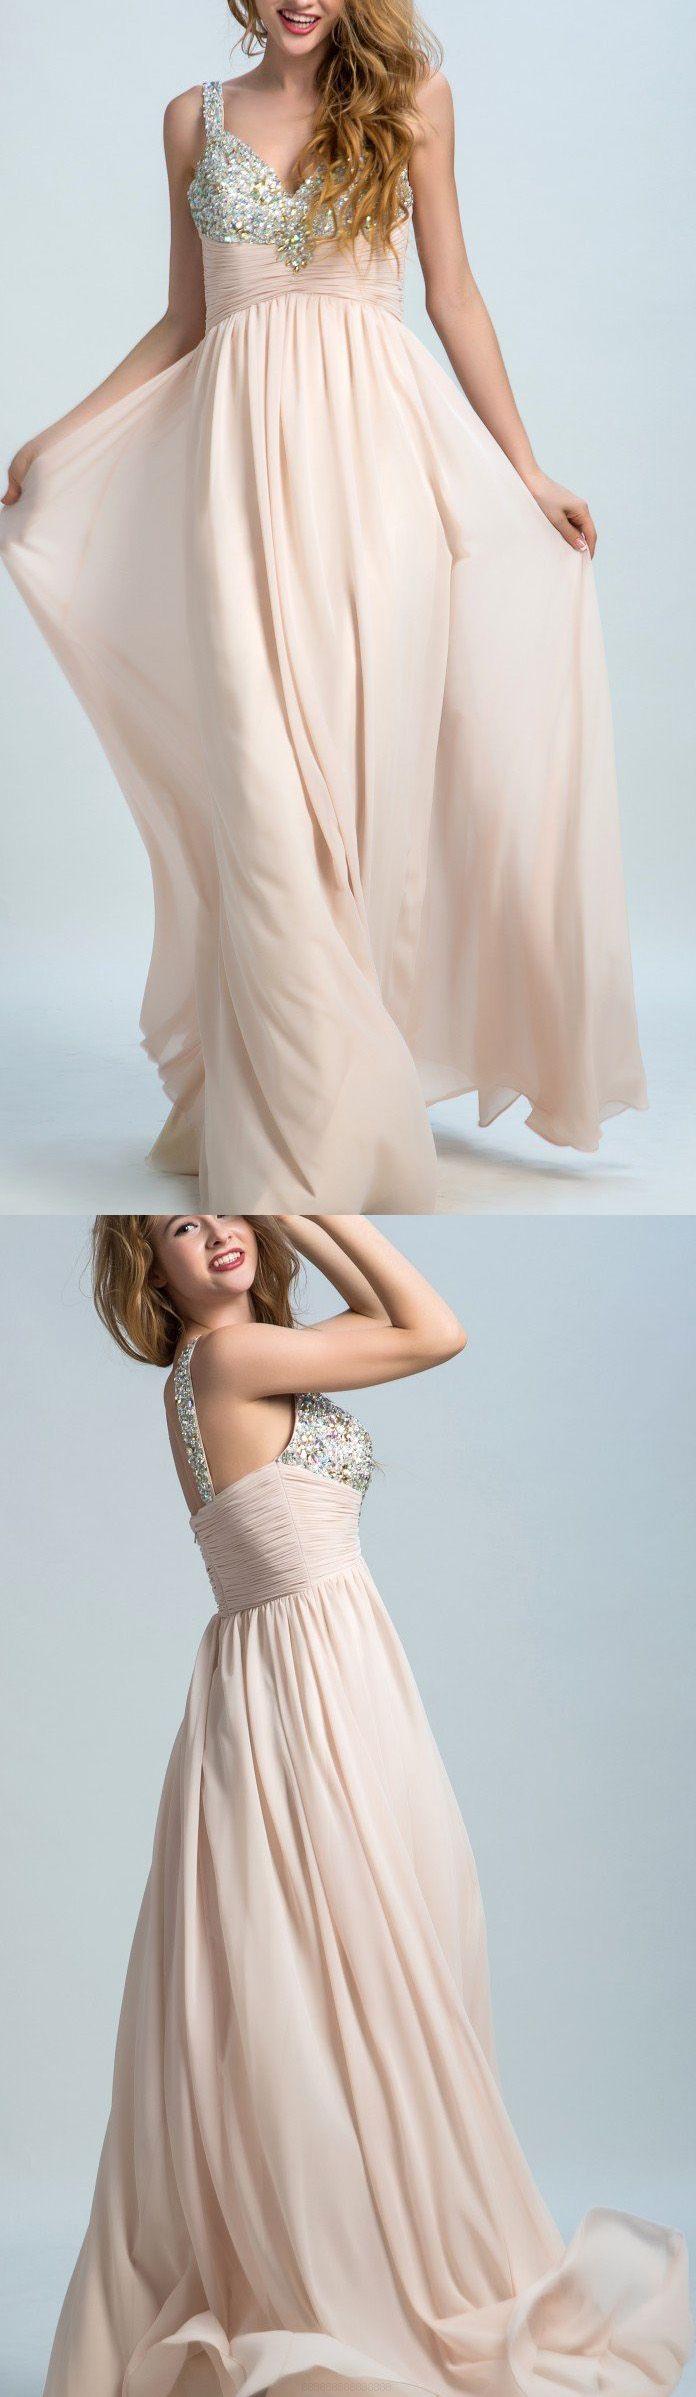 Aline evening dresses champagne alineprincess prom dresses